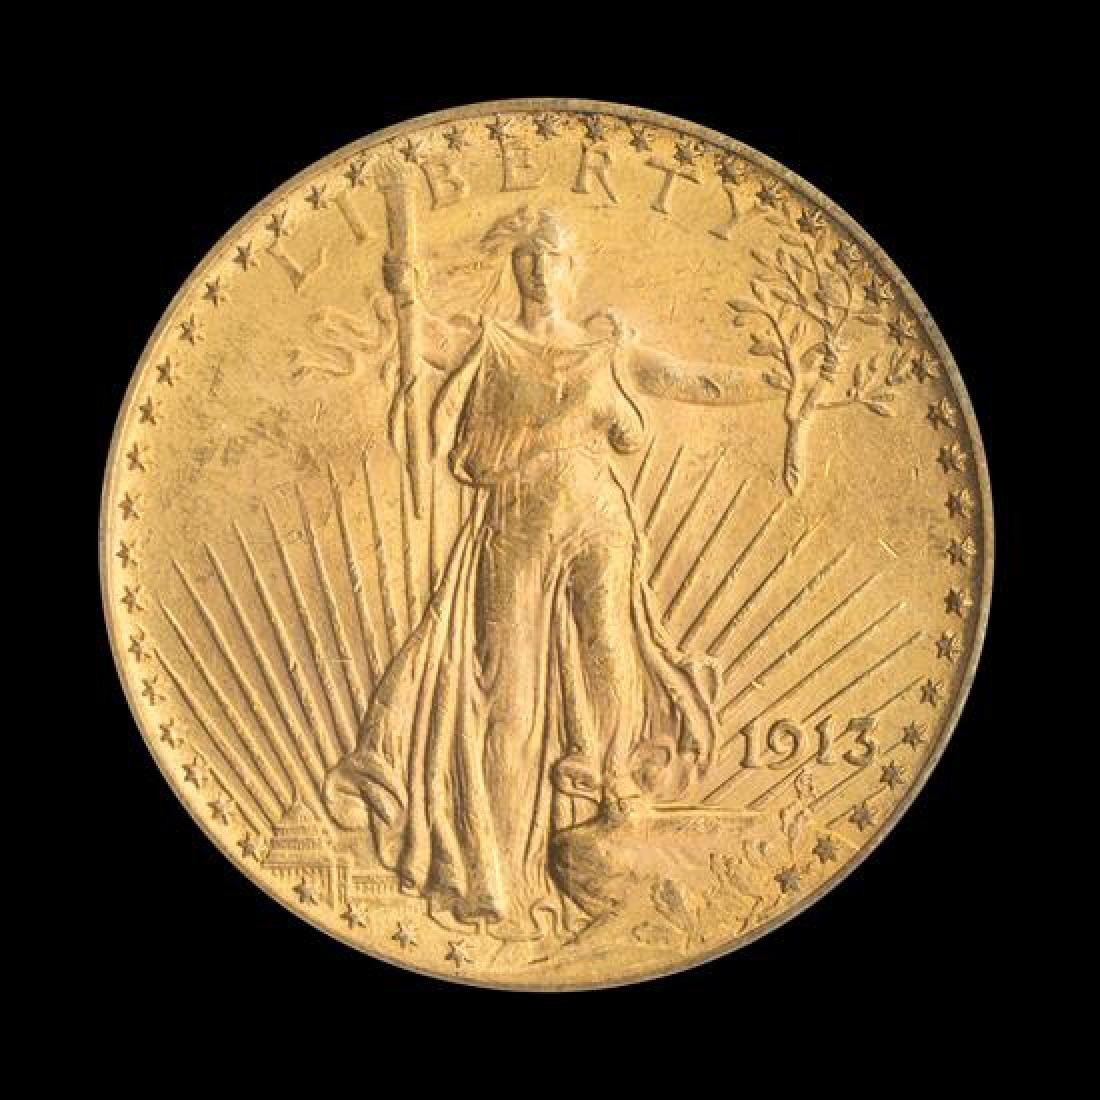 A United States 1913 Saint-Gaudens $20 Gold Coin